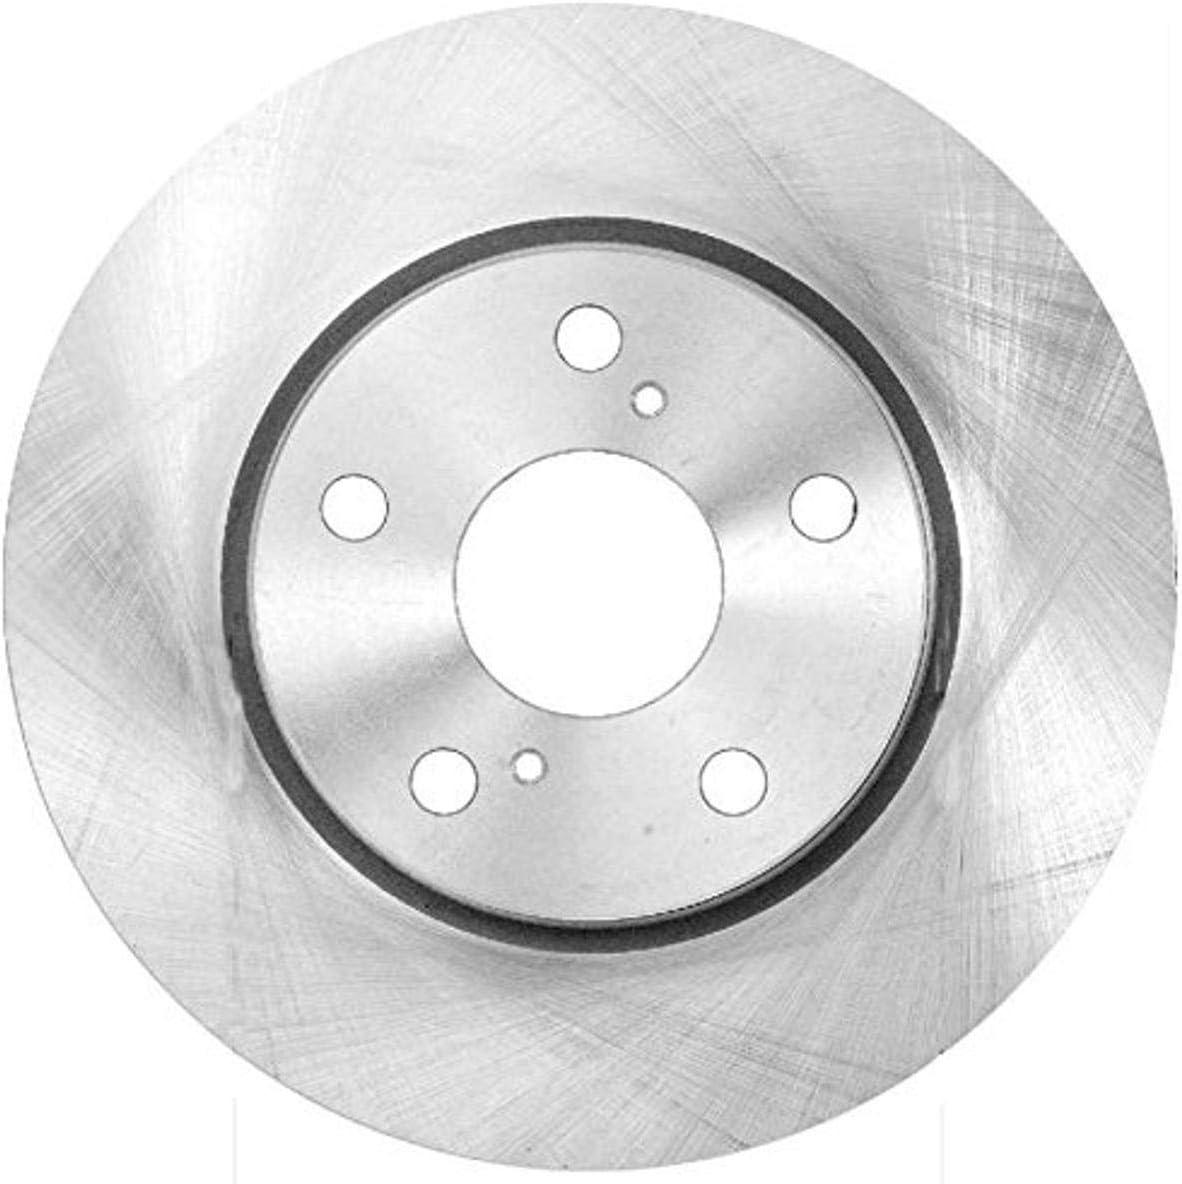 Bendix discount Outlet SALE PRT5221 Metallic Rotor Brake